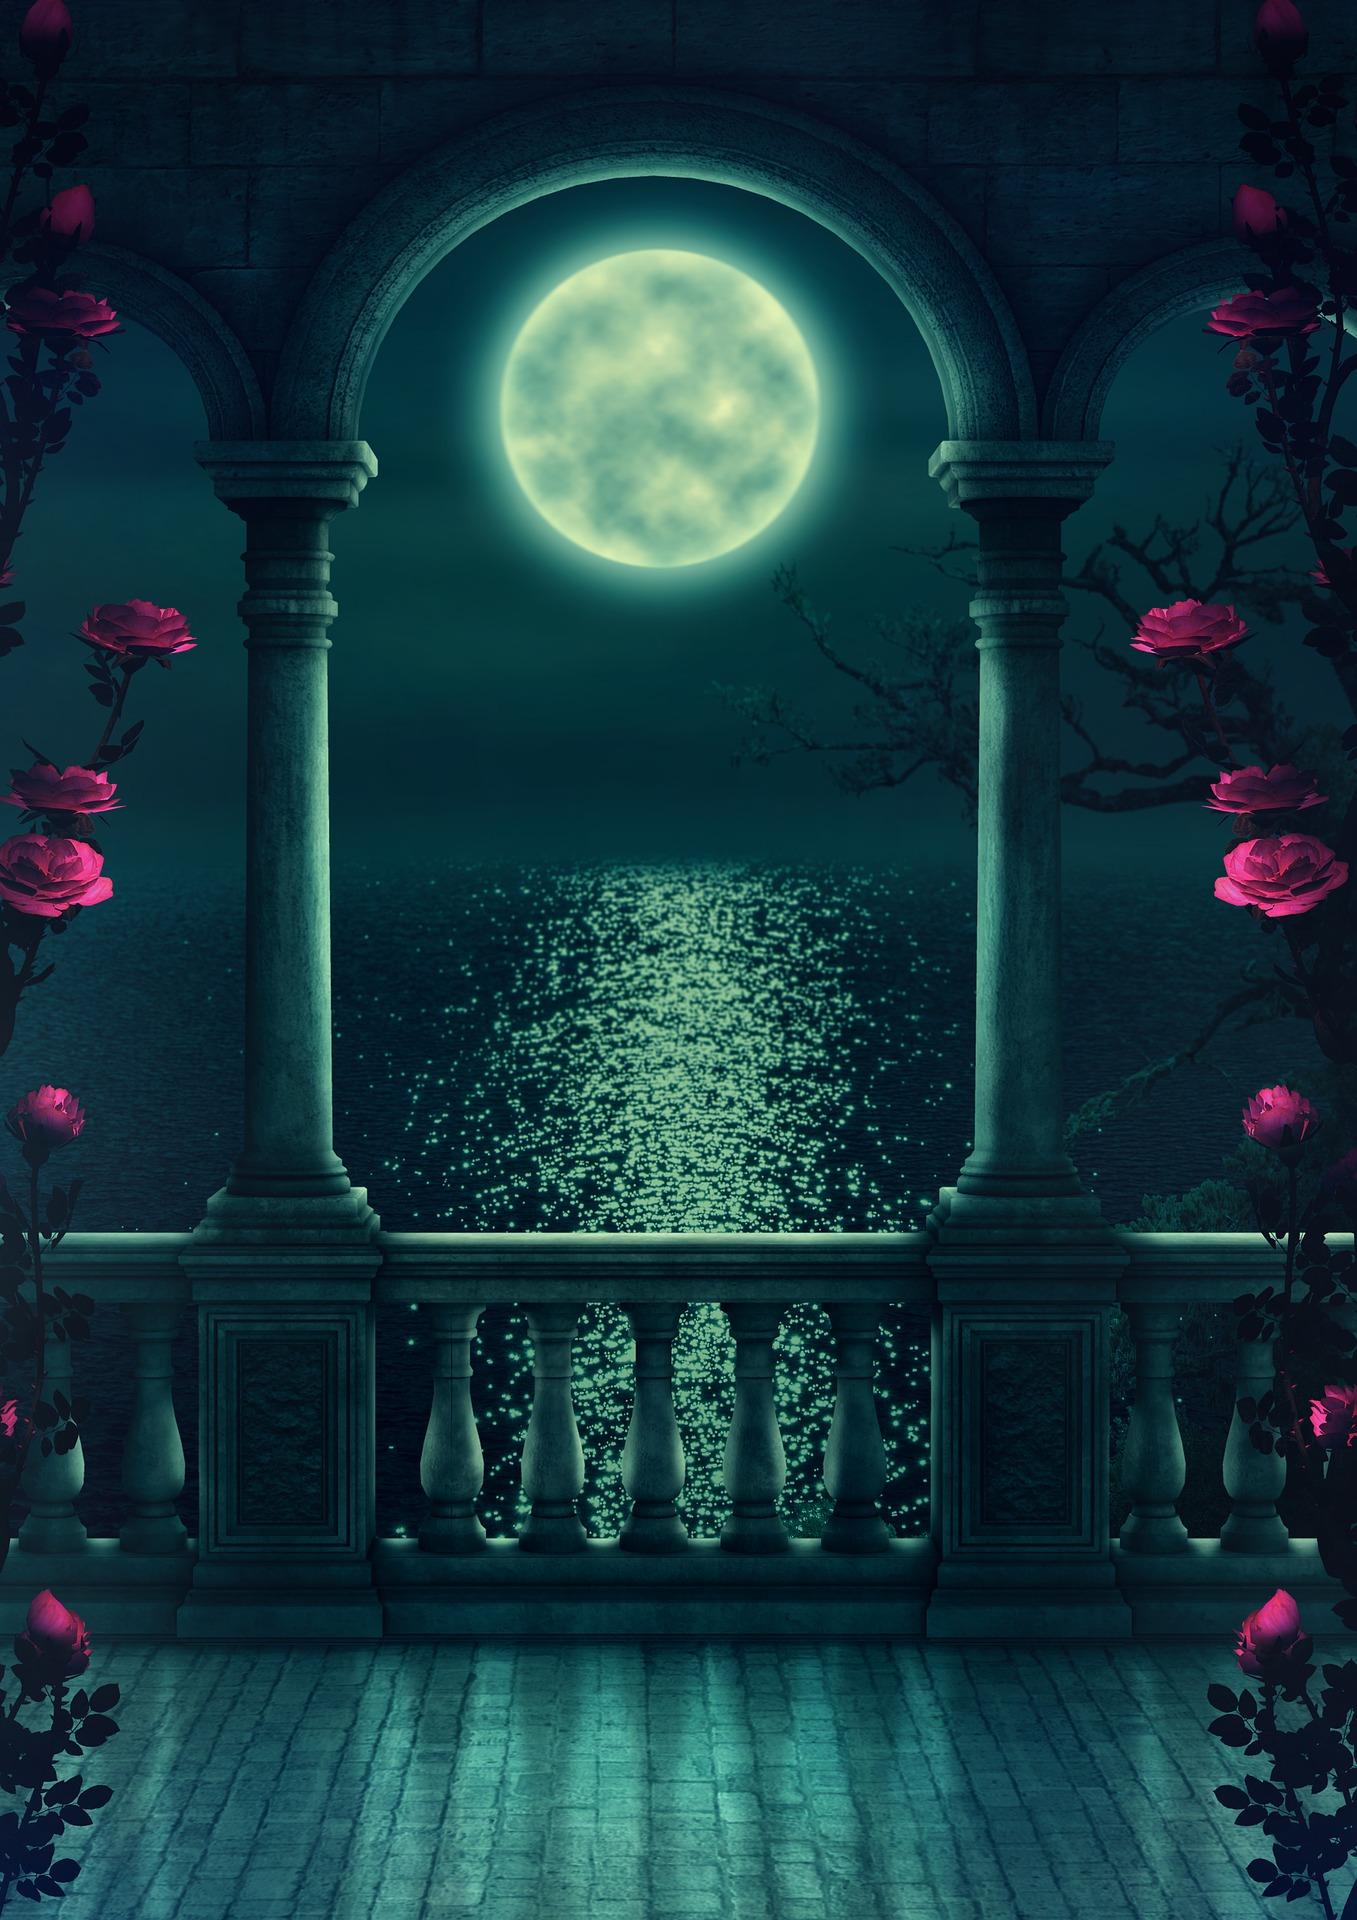 Darkmoon Art at Pixabay